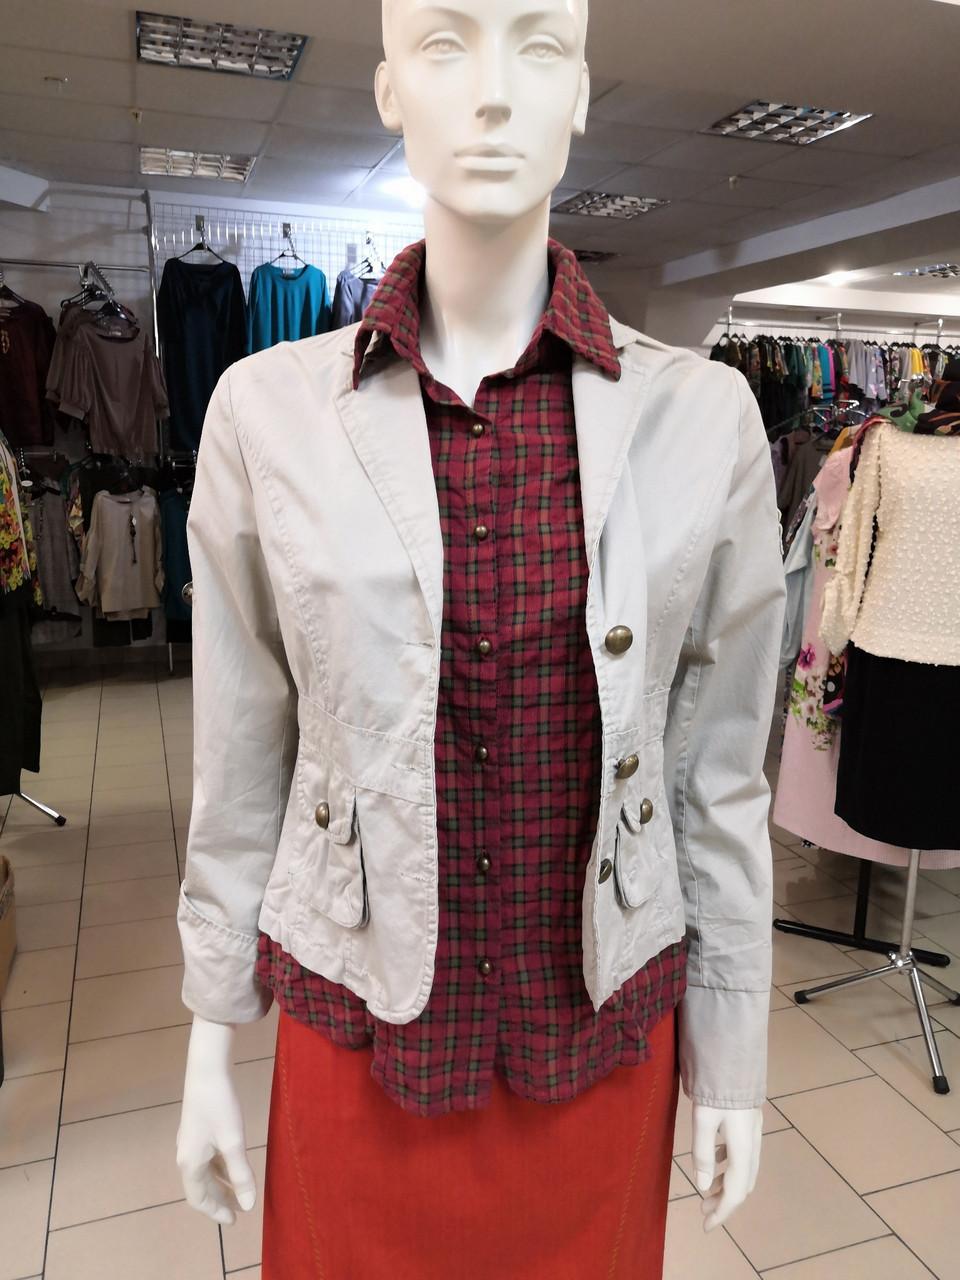 Жакет и рубашка, двойка комплект Цена за комплект 300грн акция